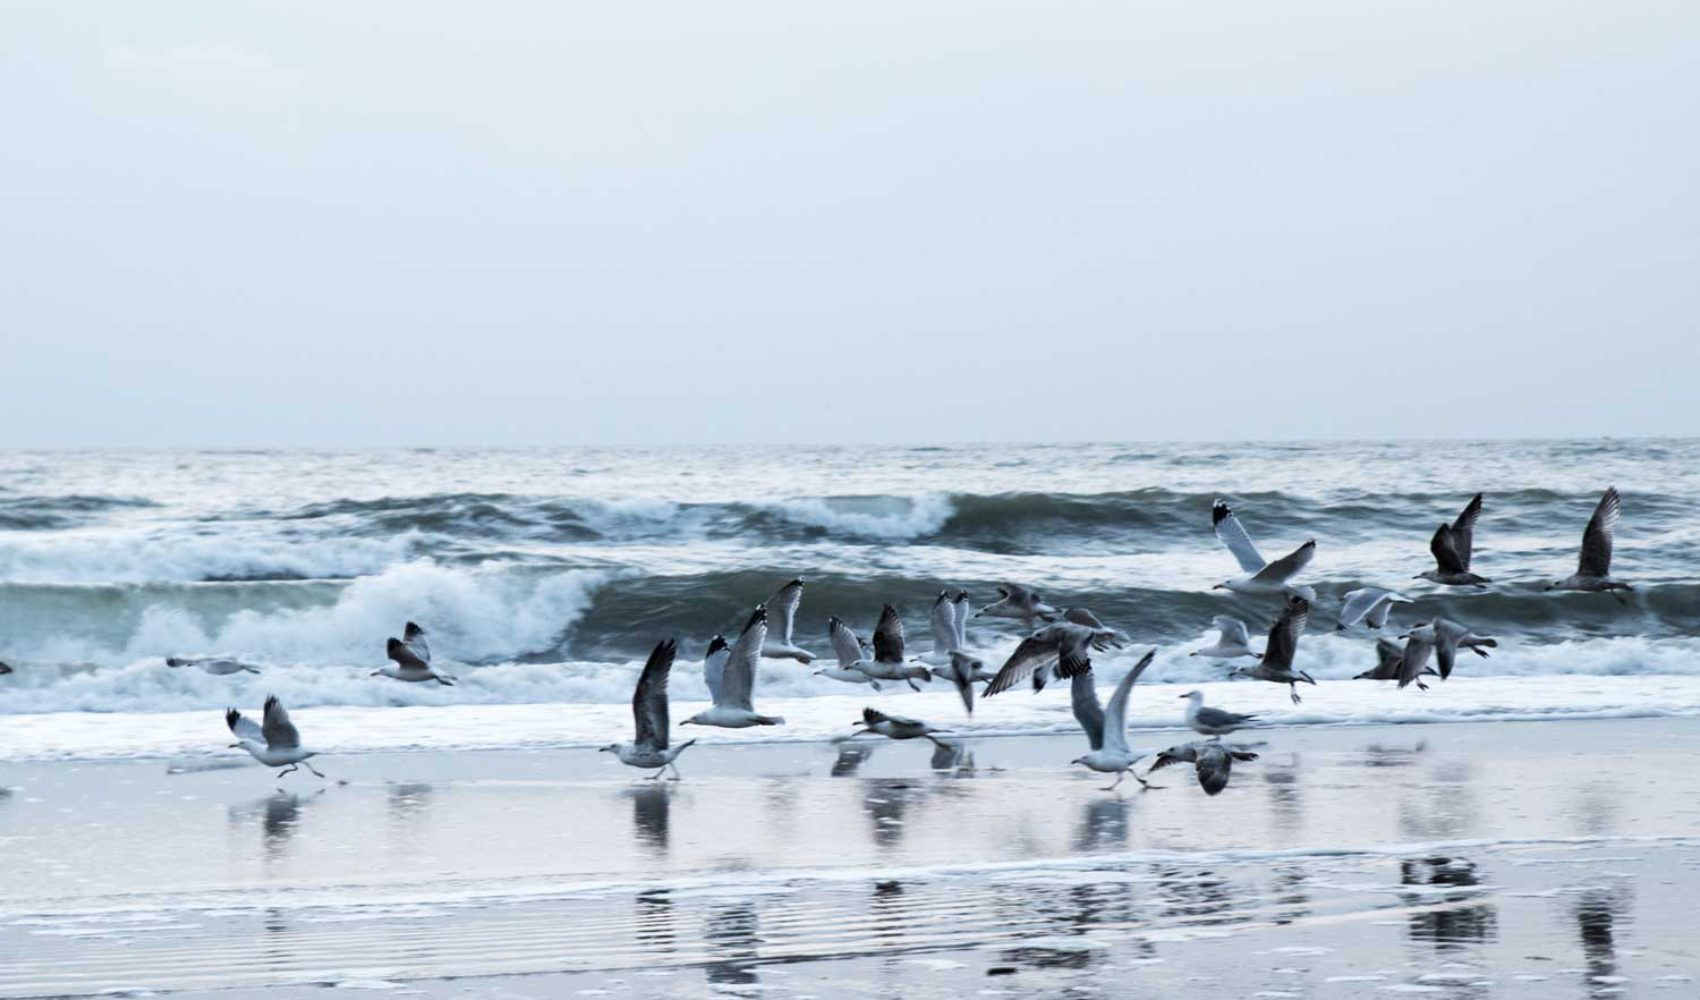 Fototagebuch 1: Nordsee  - nach dem Sturm